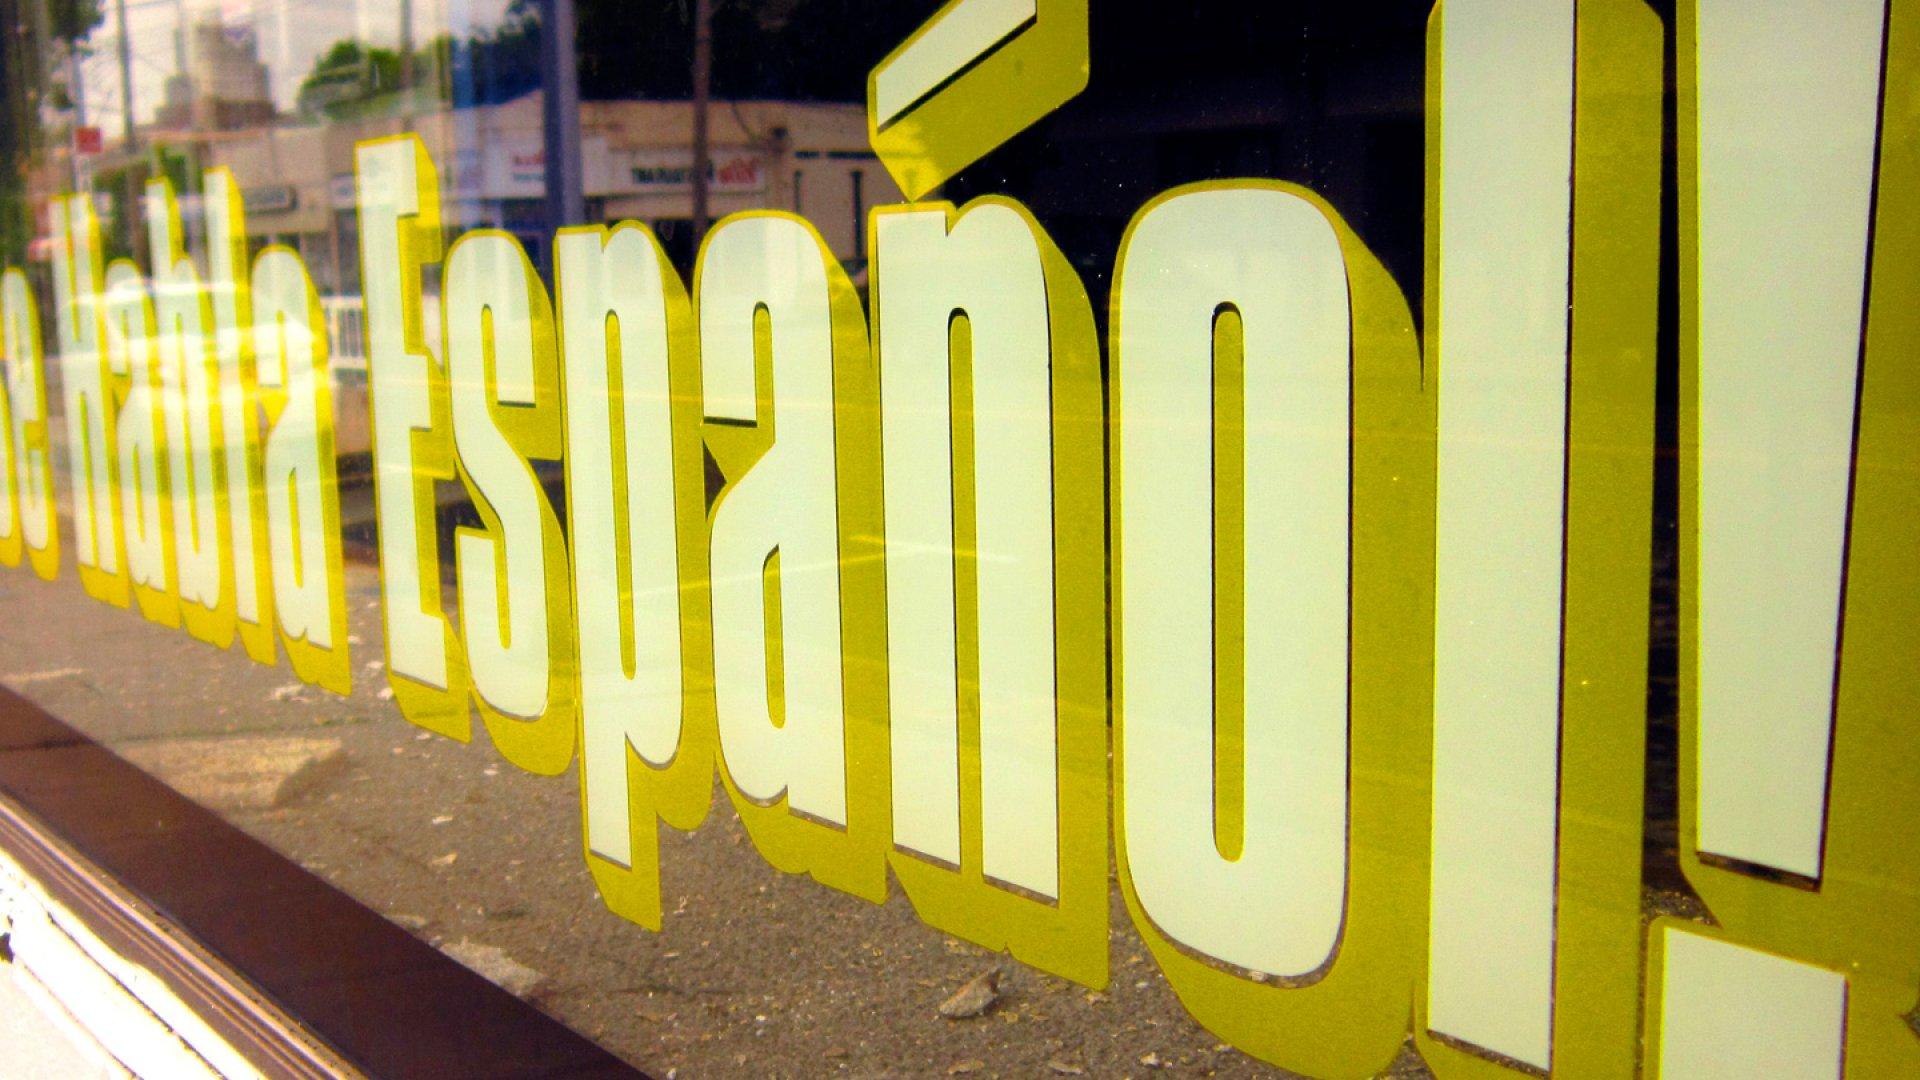 6 Reasons Marketing to Hispanics Makes Sense